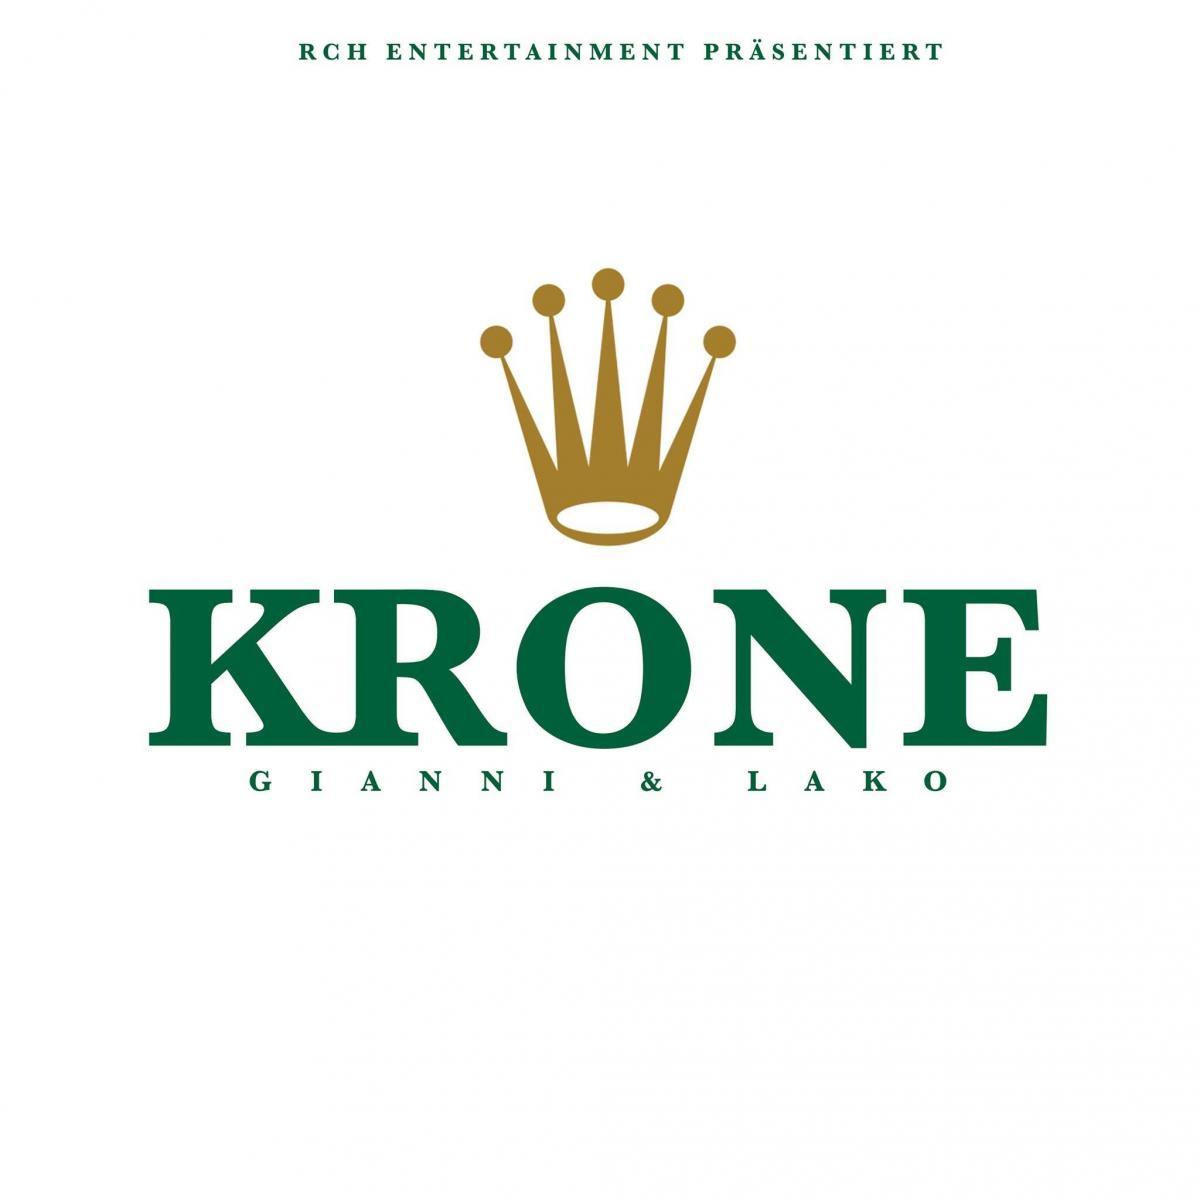 Upcoming: Gianni & Lako - Krone